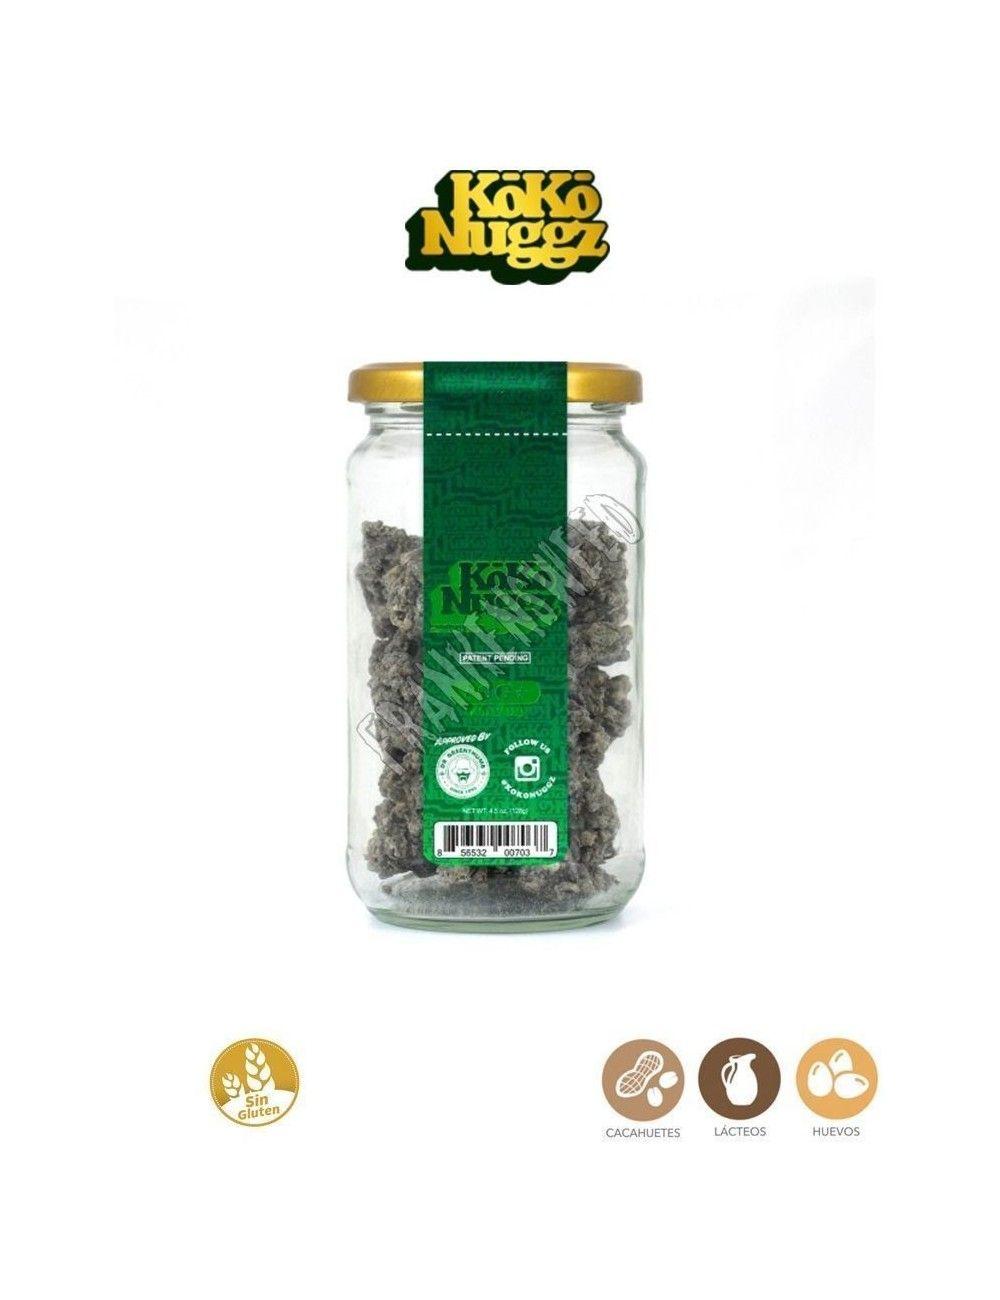 Koko Nuggz - Chocolate Bud - 4.5oz (Glass Jar)